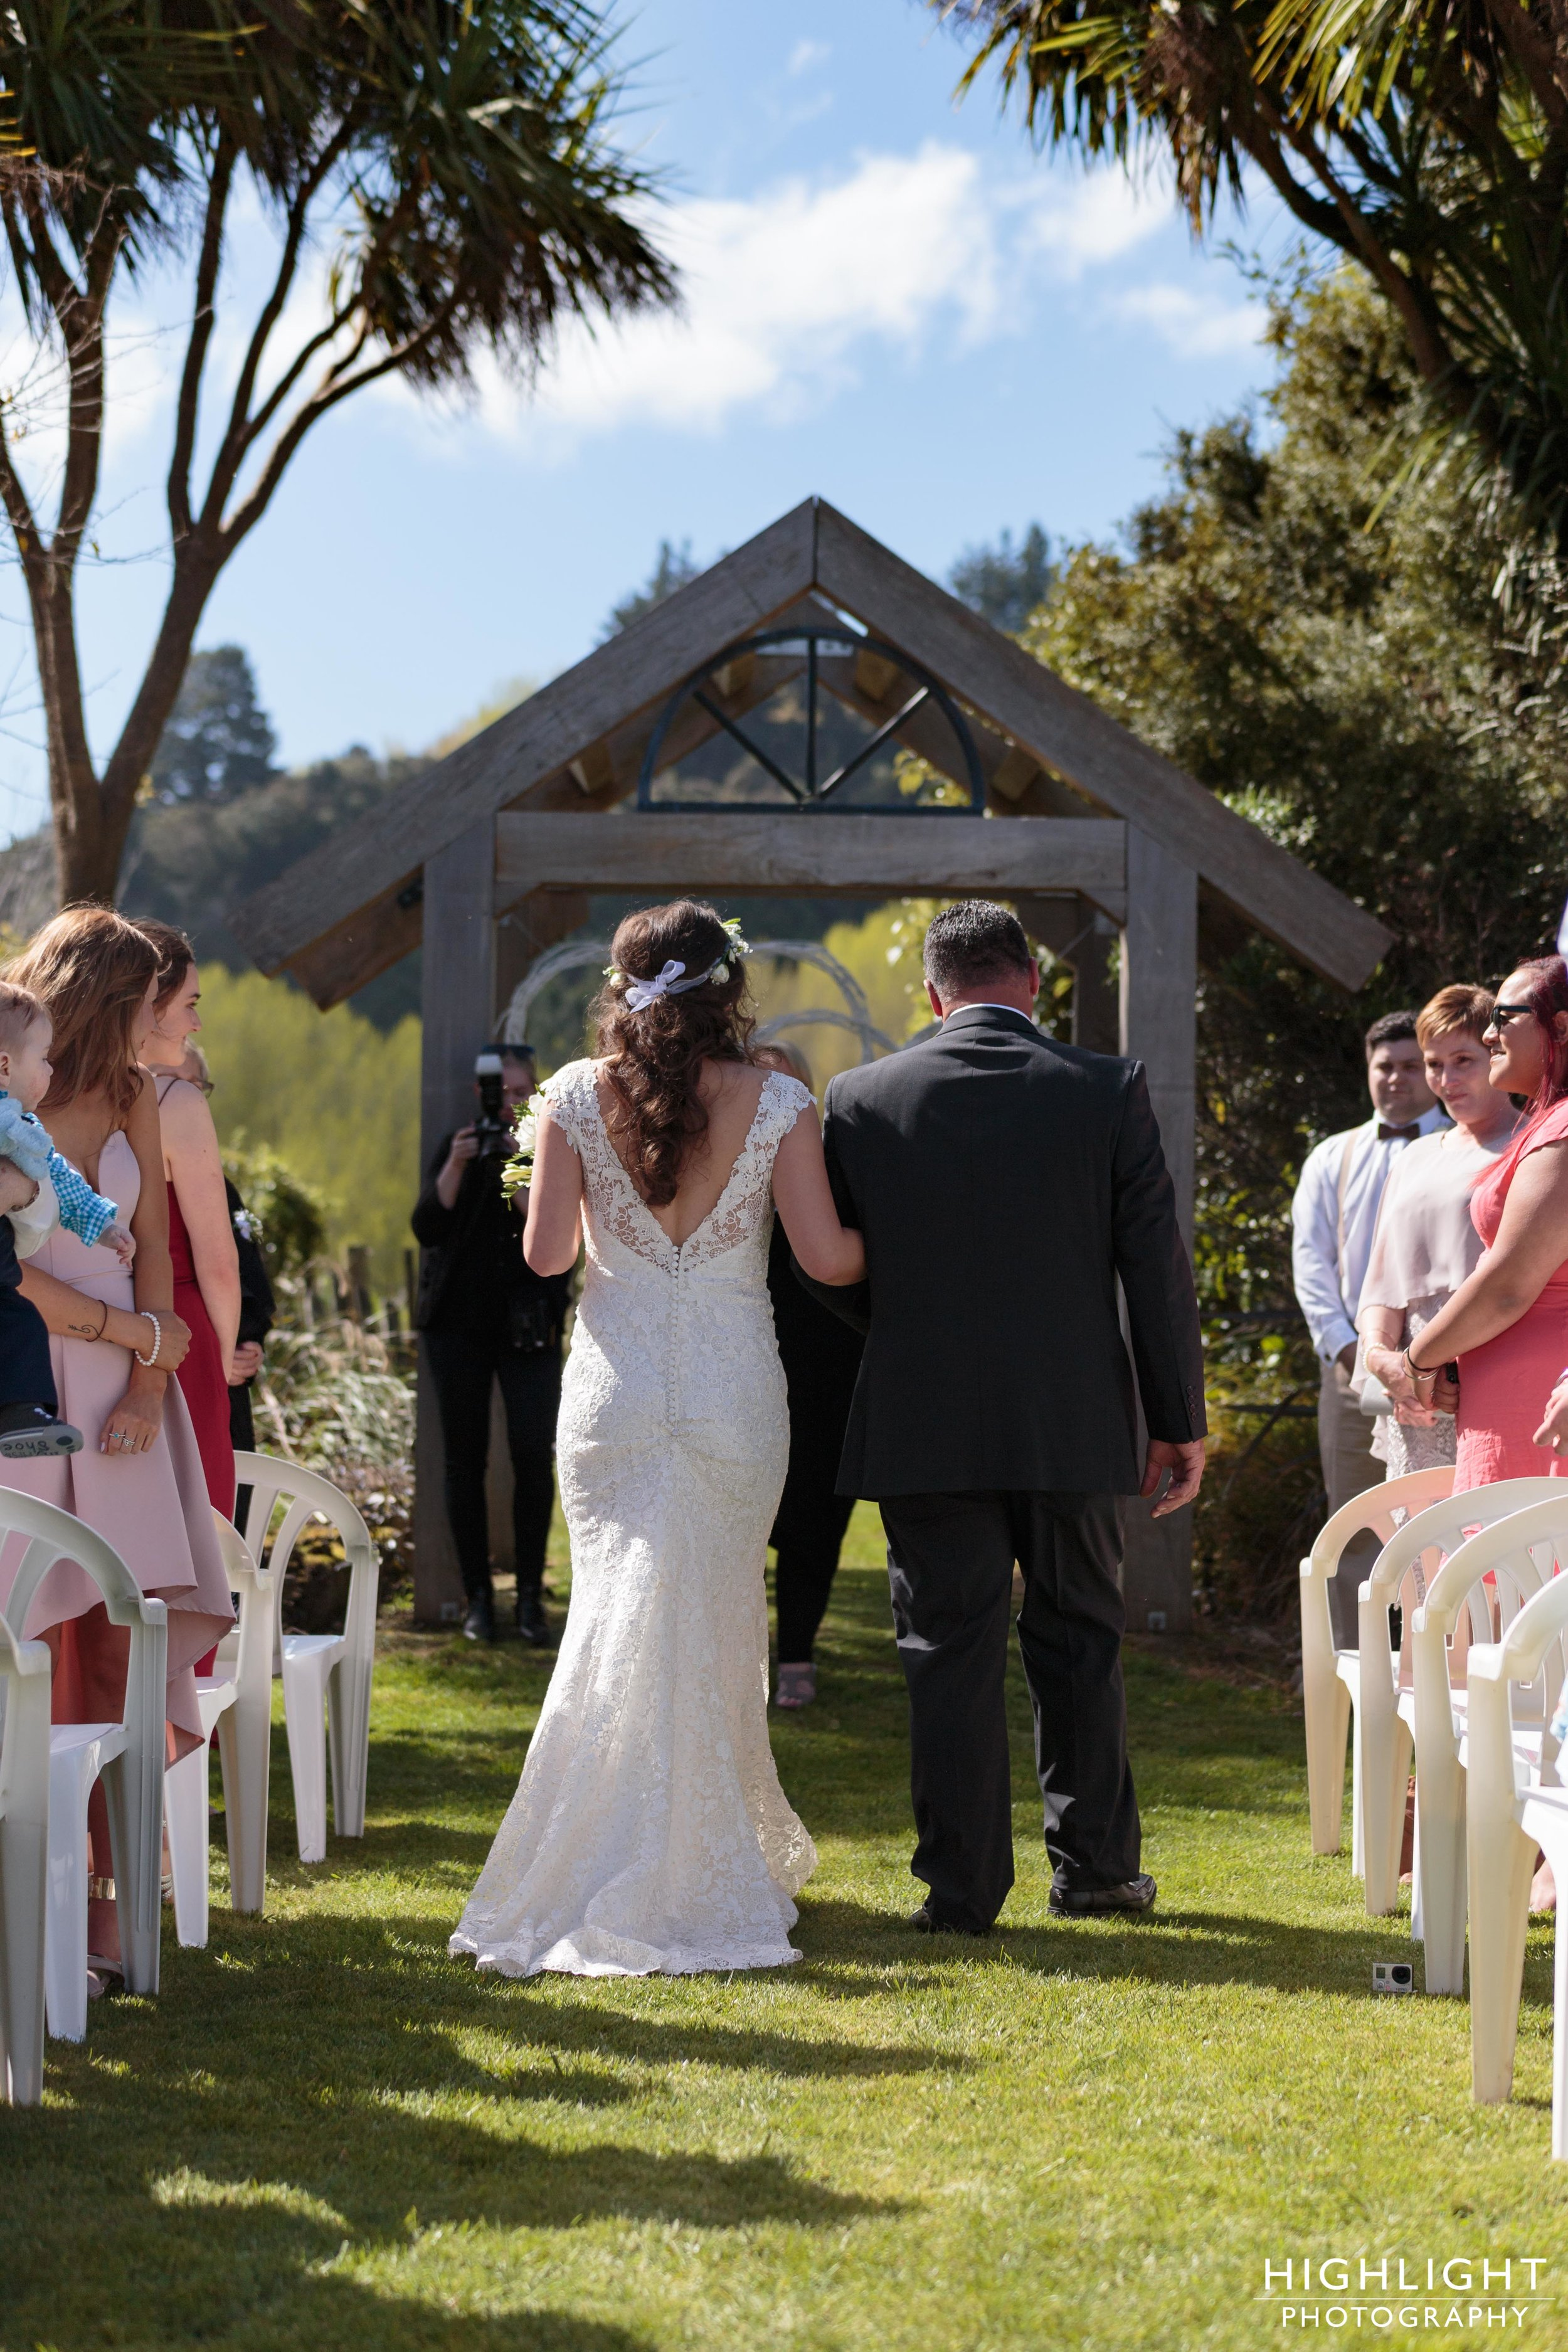 highlight_wedding_photography_makoura_lodge_manawatu_new_zealand-64.jpg